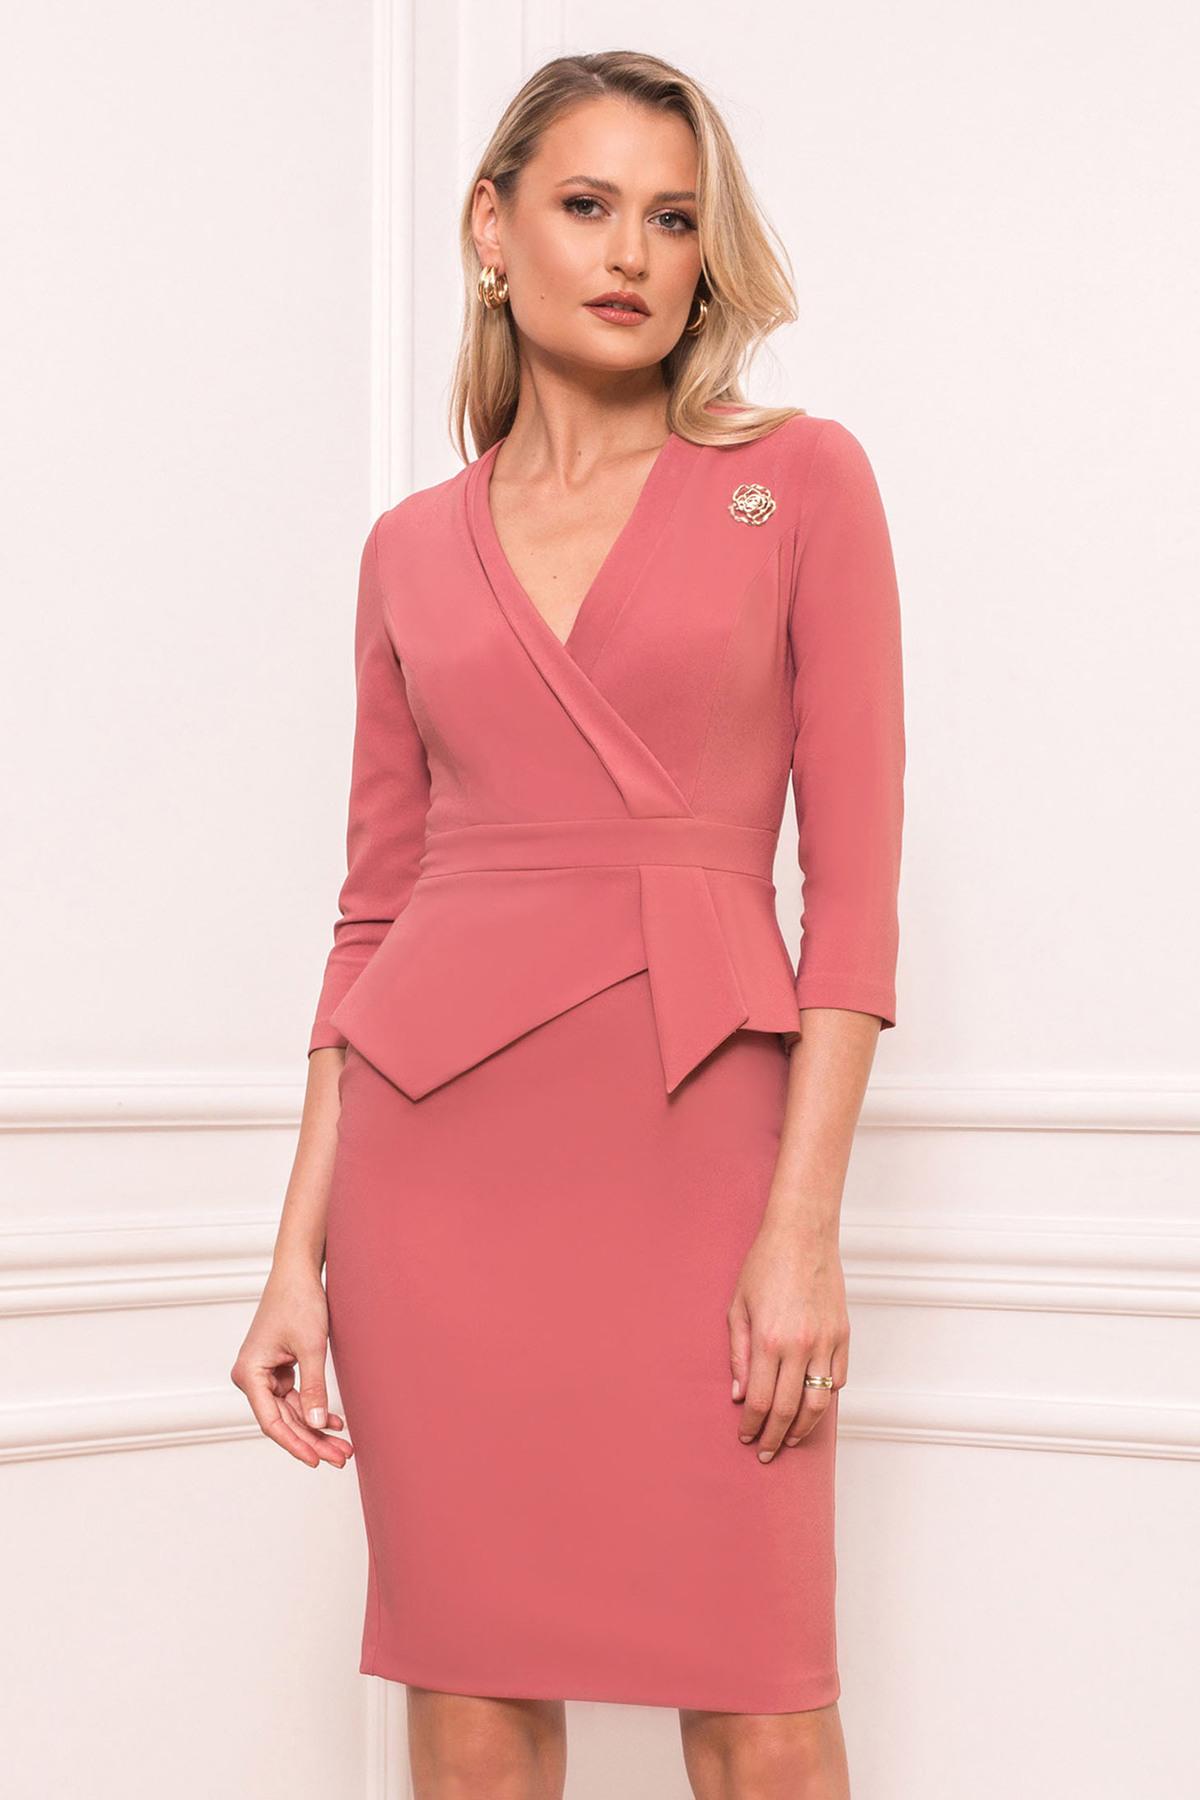 Rochie PrettyGirl roz prafuit eleganta tip creion cu peplum decolteu petrecut accesorizata cu brosa